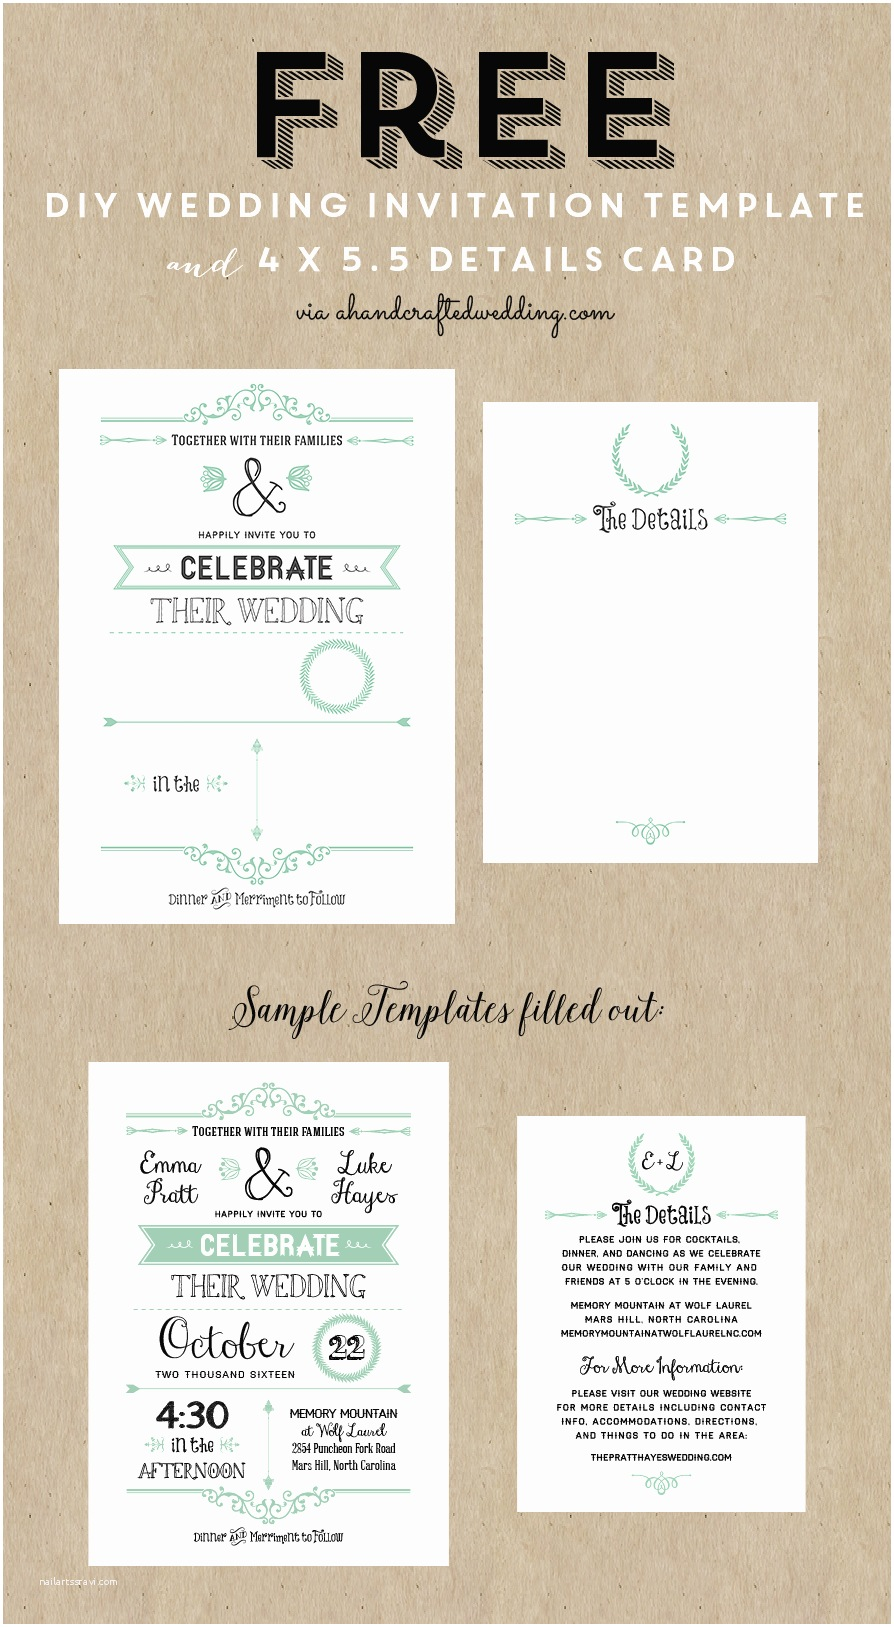 Awesome Wedding Invitations Amazing Diy Printable Wedding Invitations to Inspire You